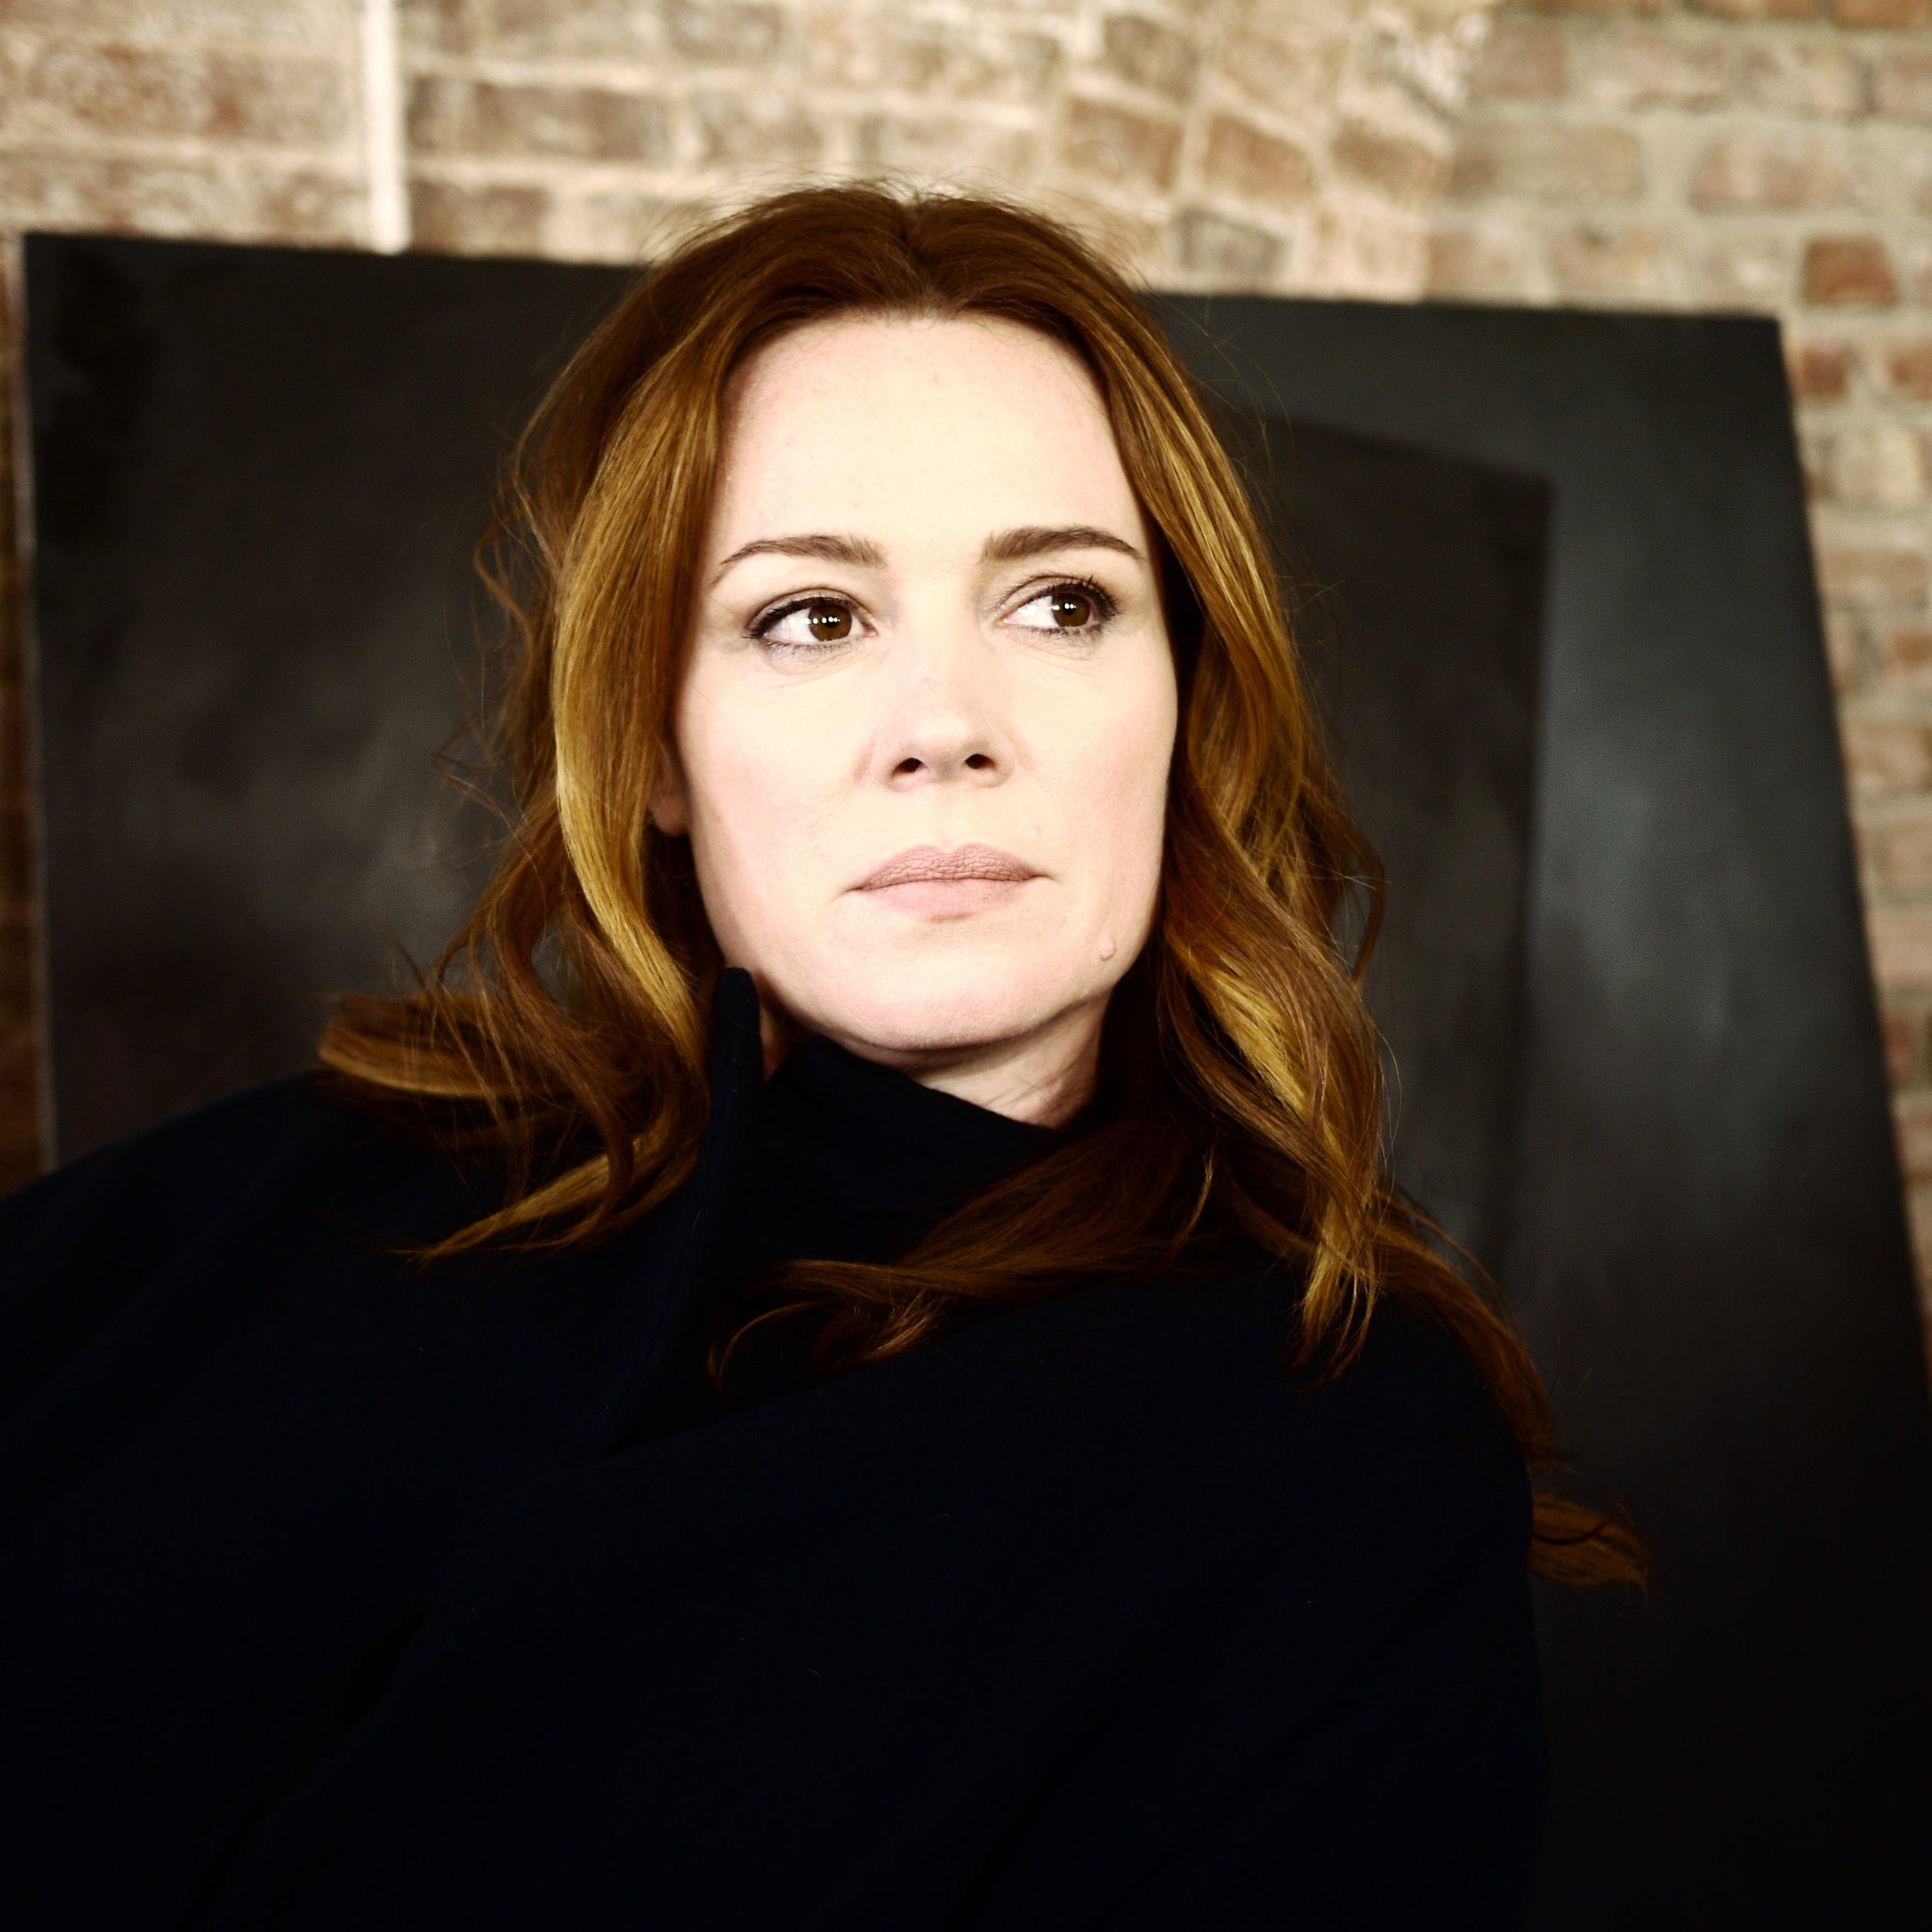 Adrianne de Loia - Founder and Creative Director